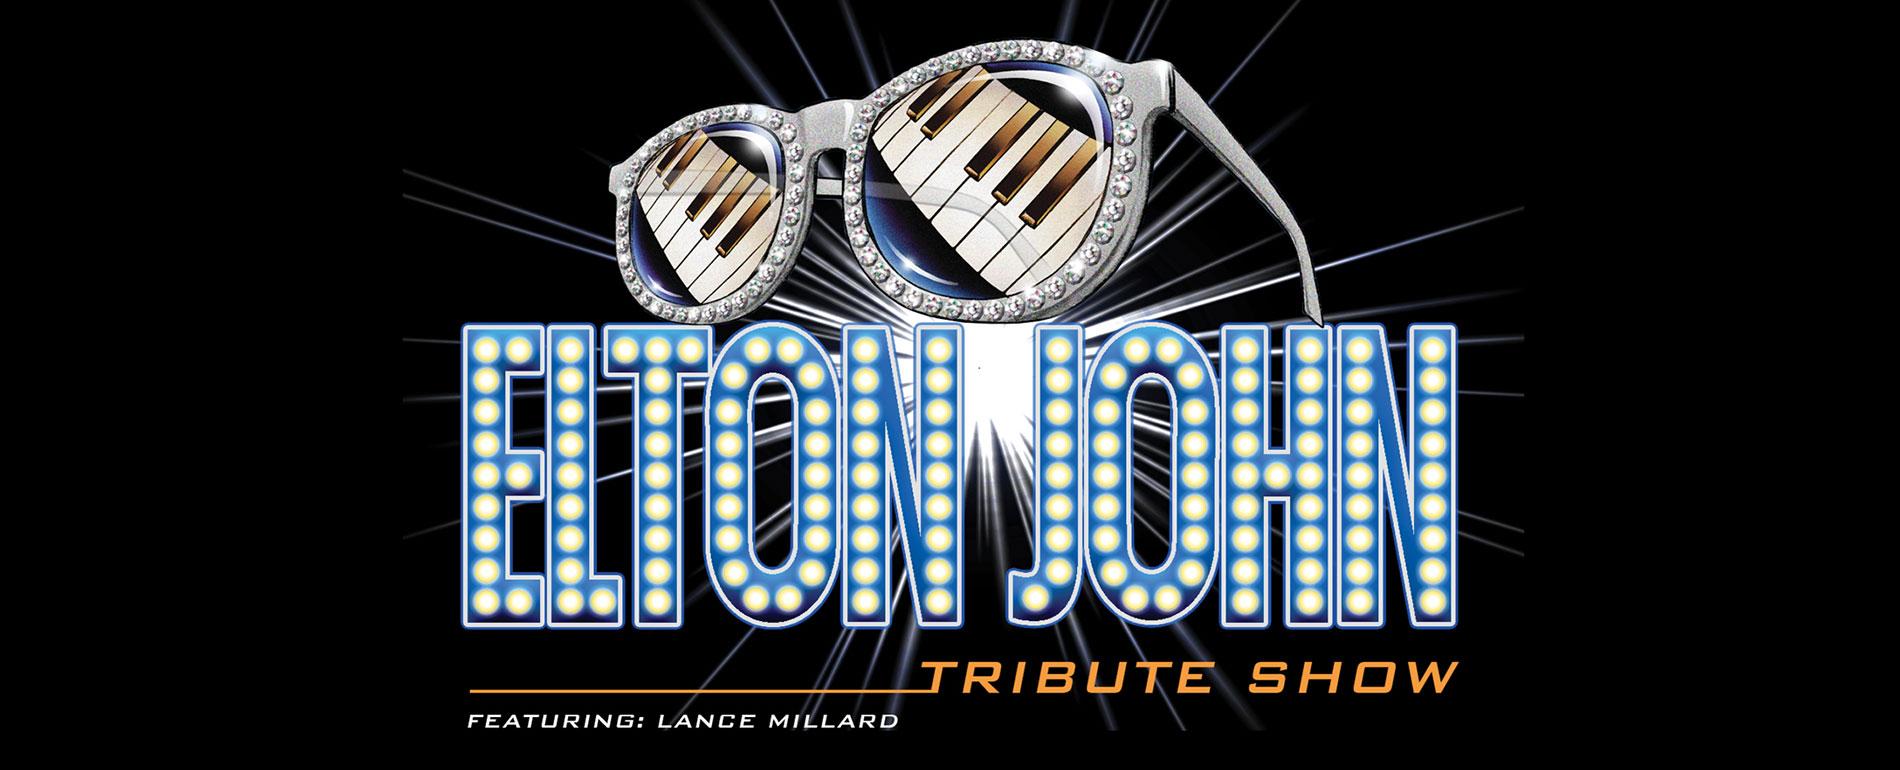 Elton john tribute - pocono live concert